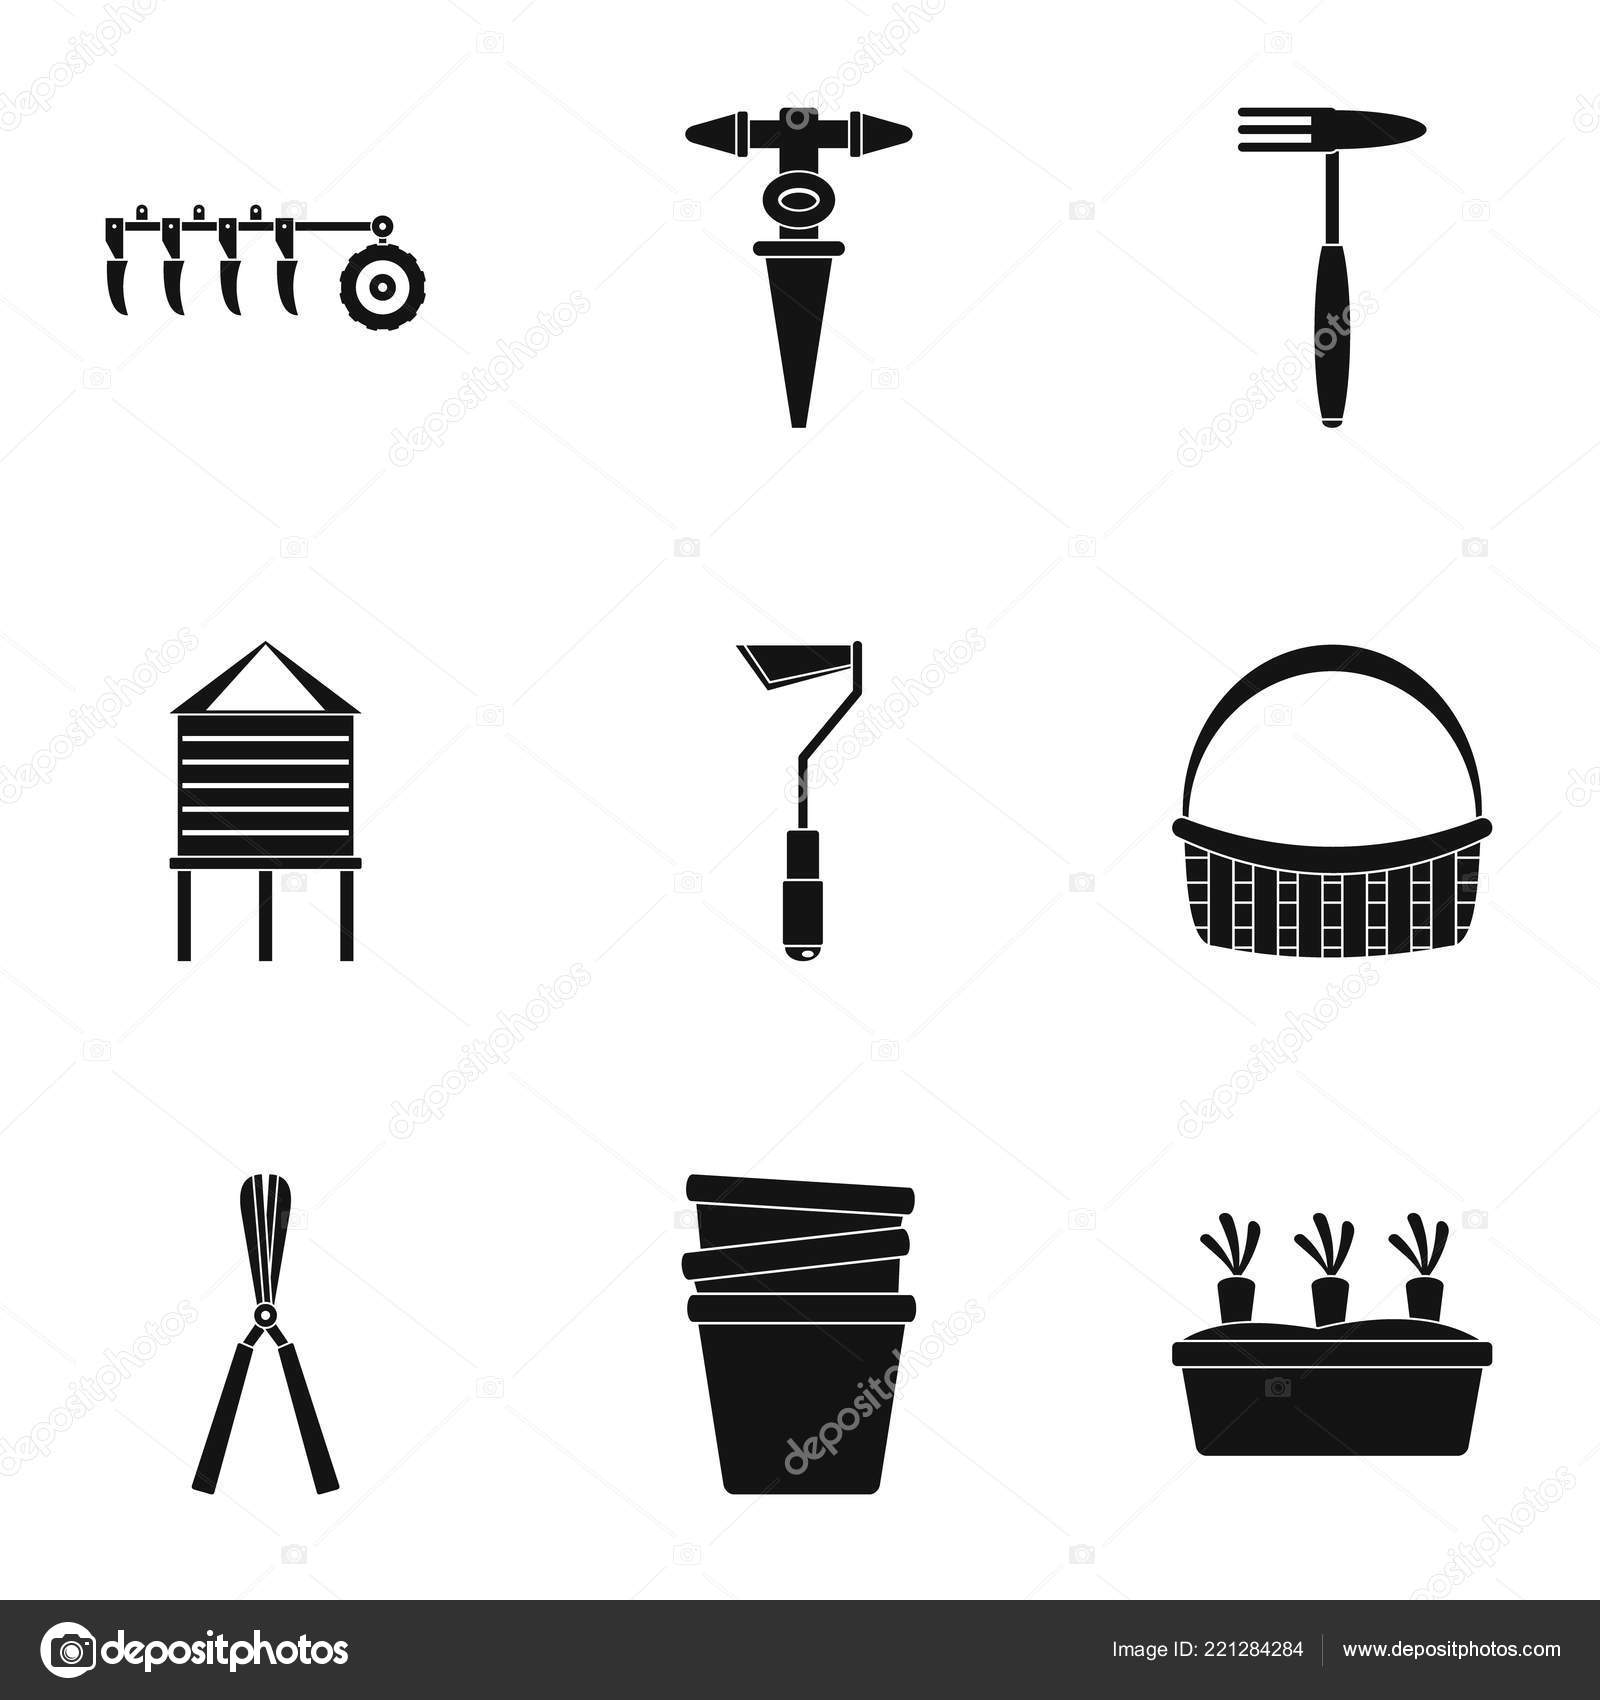 Outil de jardin jeu d\'icônes, style simple — Image ...